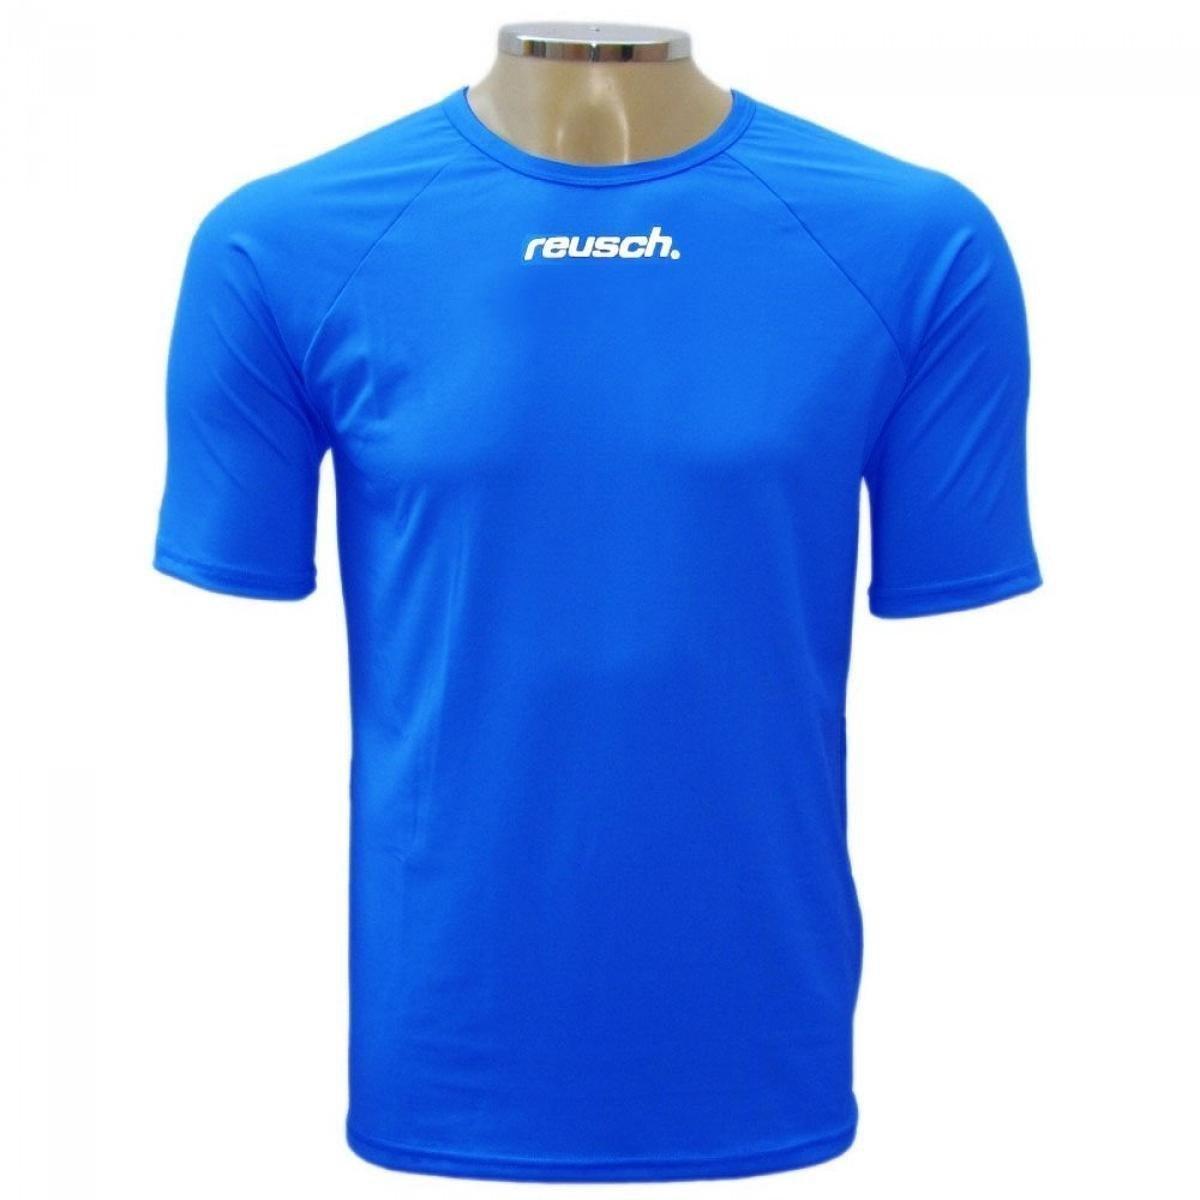 2d8260e85390d Camisa térmica Reusch Underjersey M C - Compre Agora